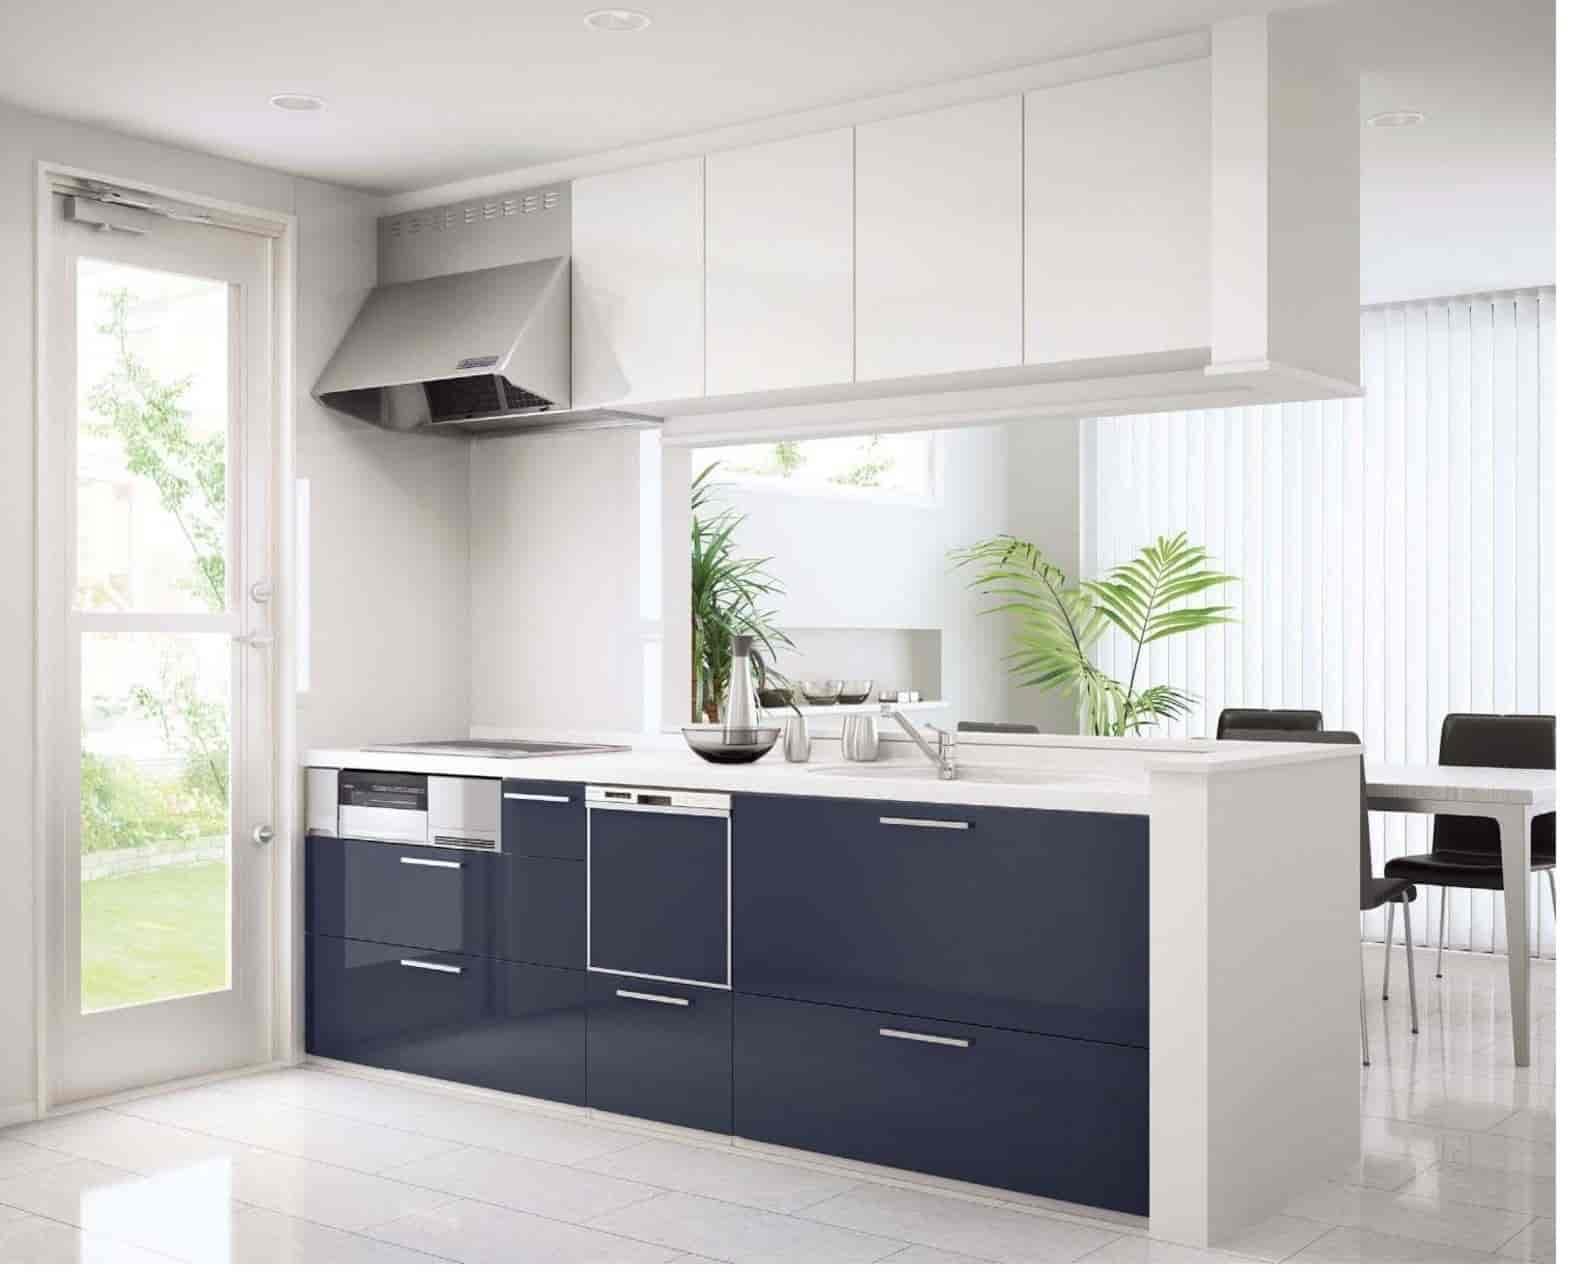 N Makkana Steel Art And Modular Kitchen And Interior Photos, New ...